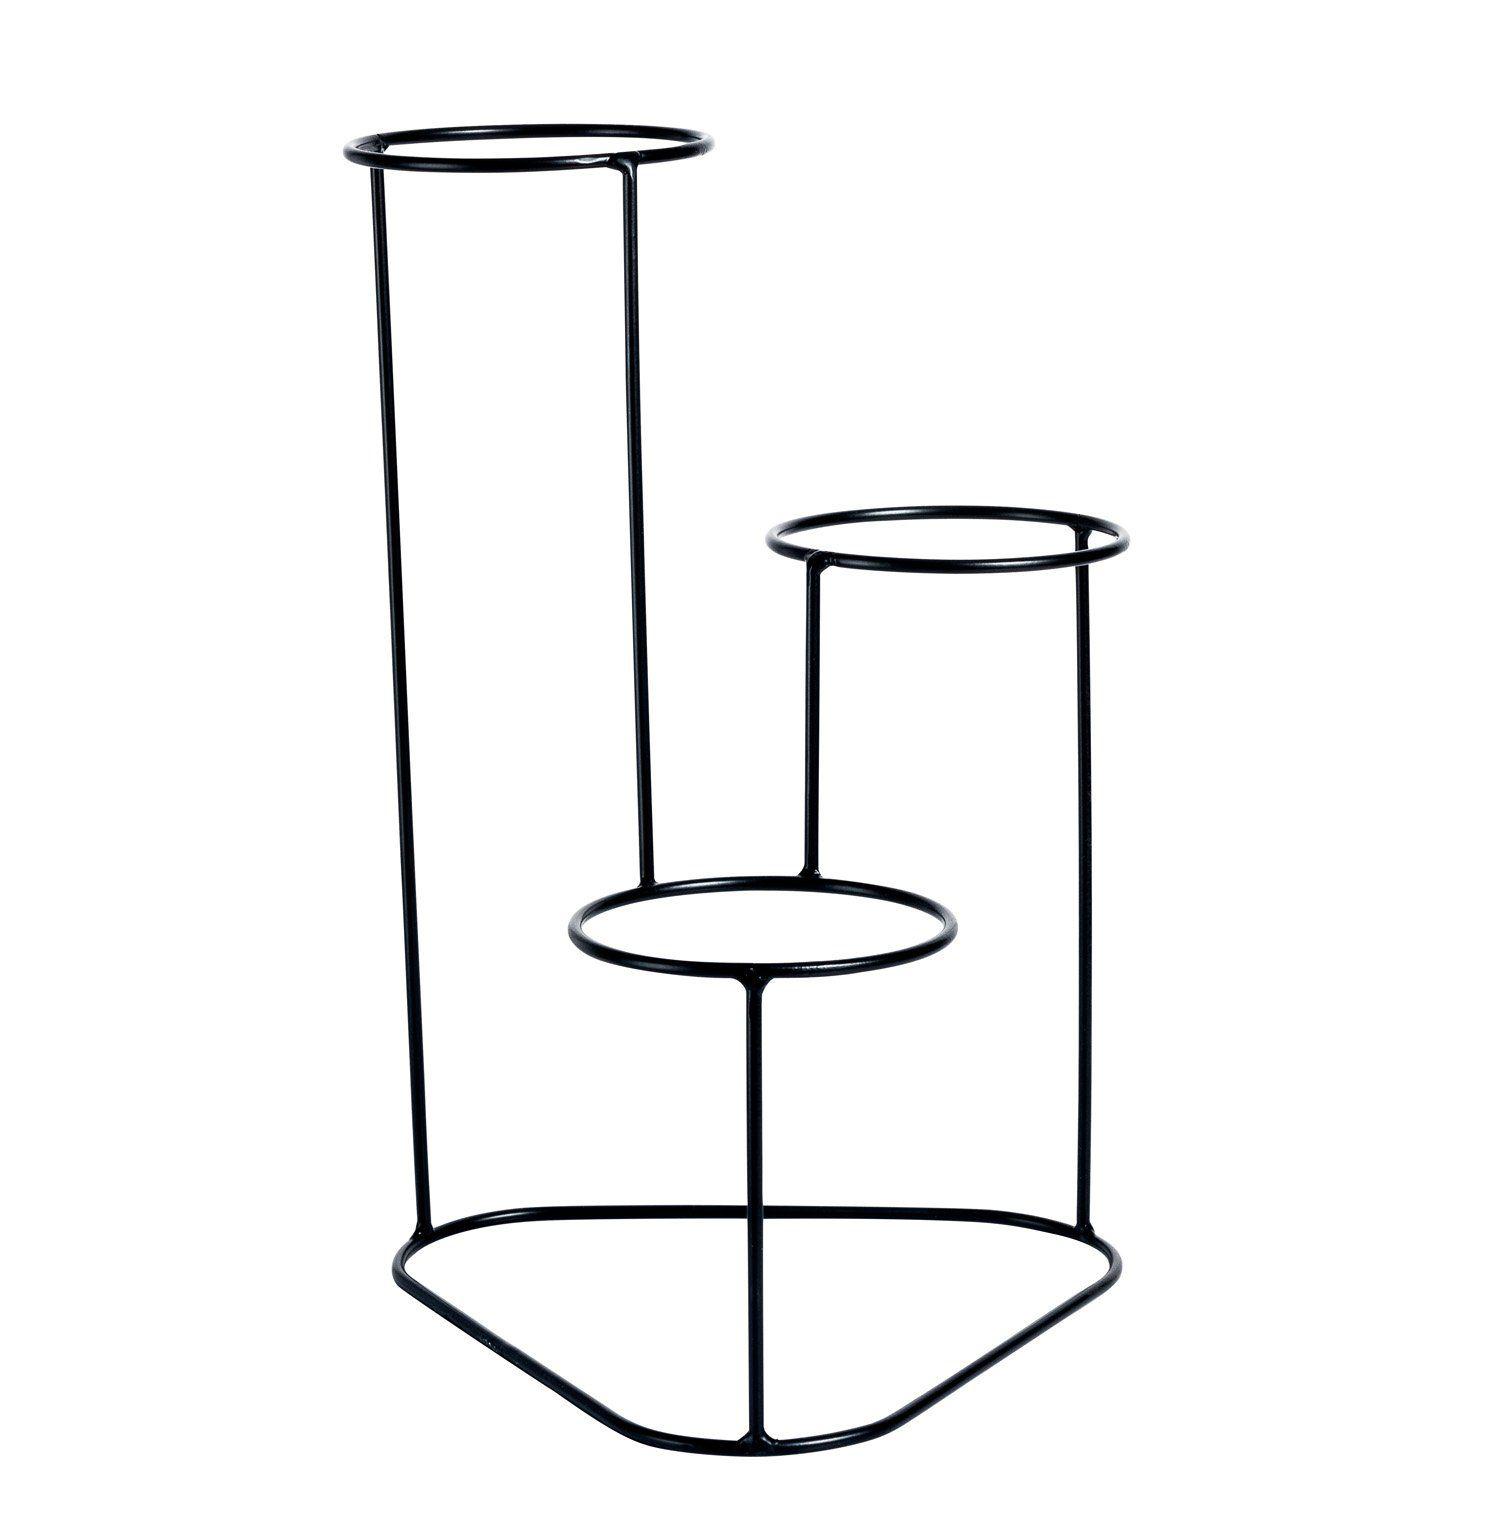 Suporte Aramado Cascata Preto 40cm para 03 Vasos Raiz Pequenos N02  - Vasos Raiz Loja Oficial